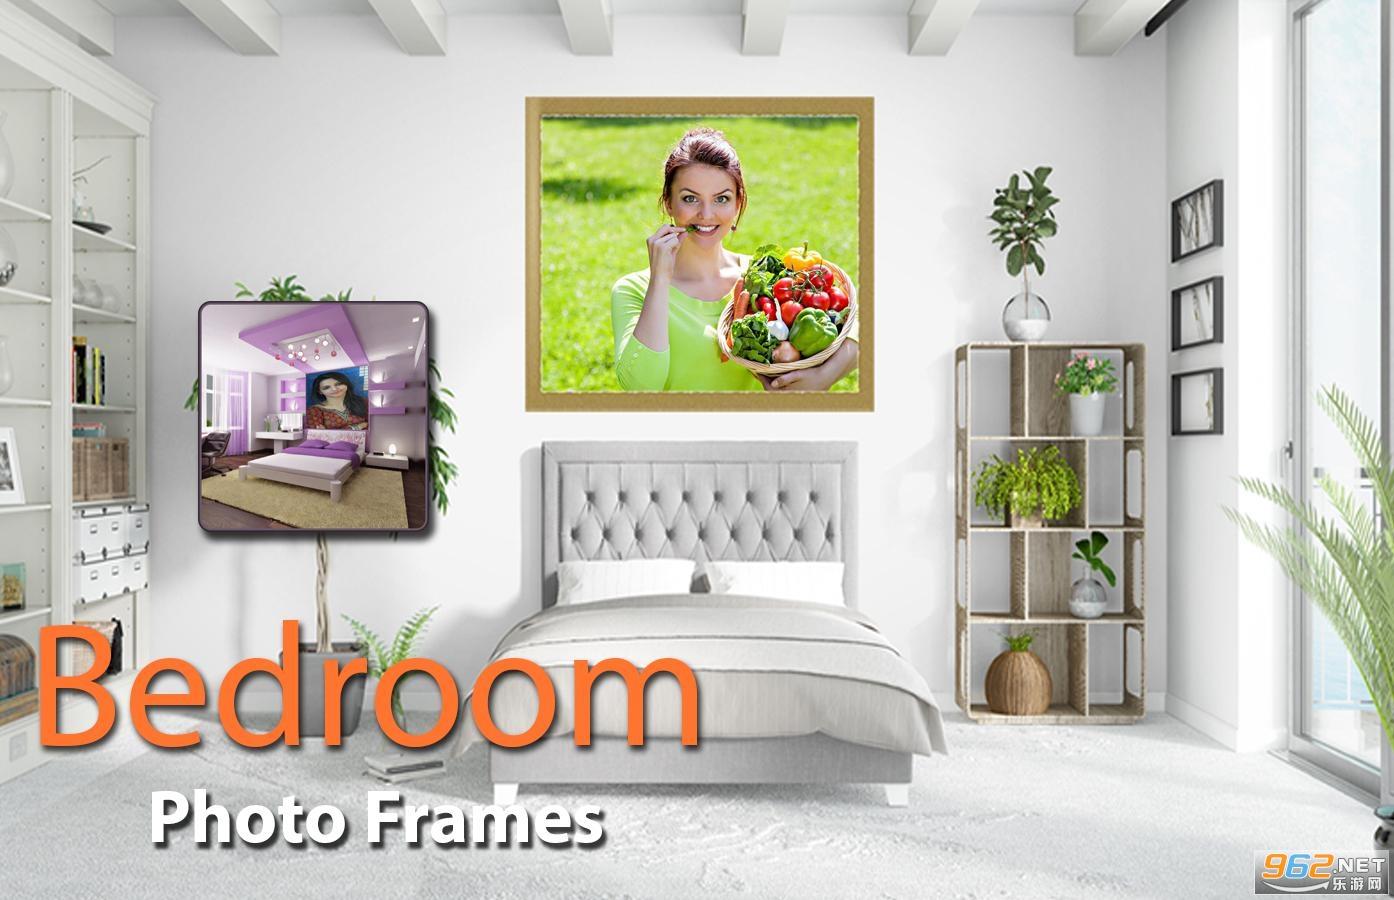 Bedroom Photo Frames卧室相框v14.0 最新版截图1